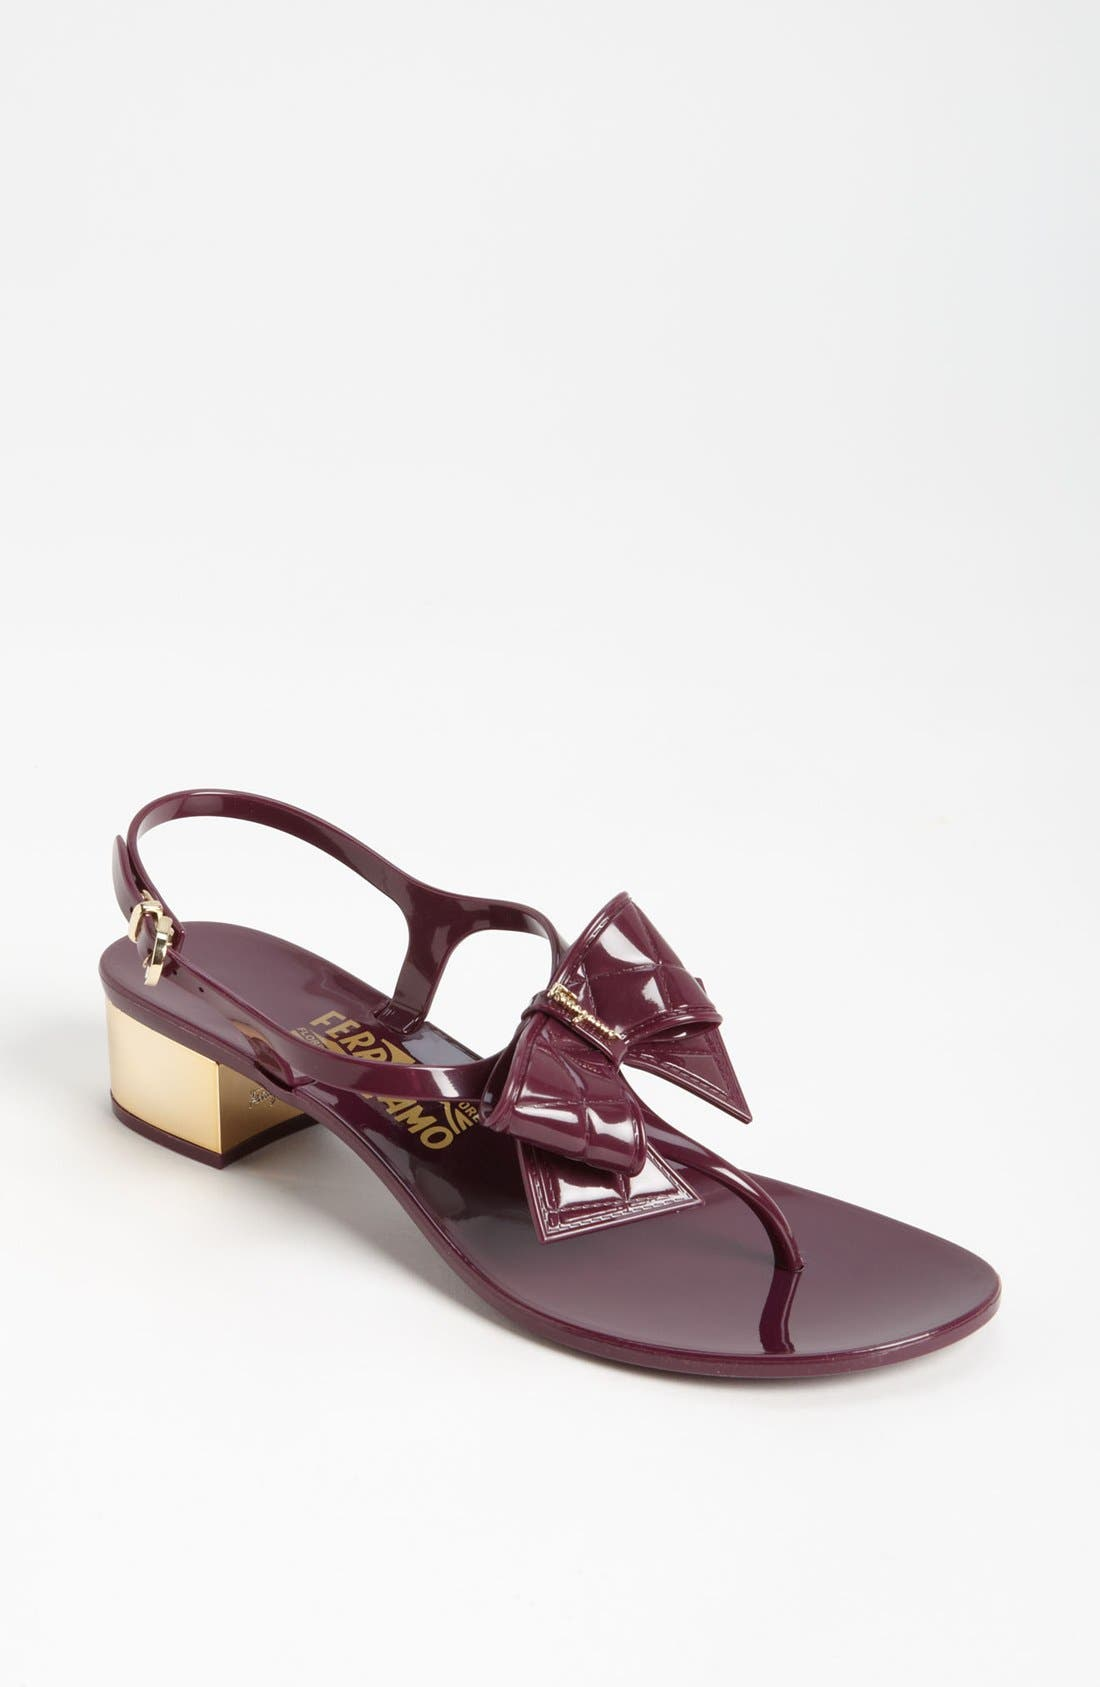 Alternate Image 1 Selected - Salvatore Ferragamo 'Sunshine' Sandal